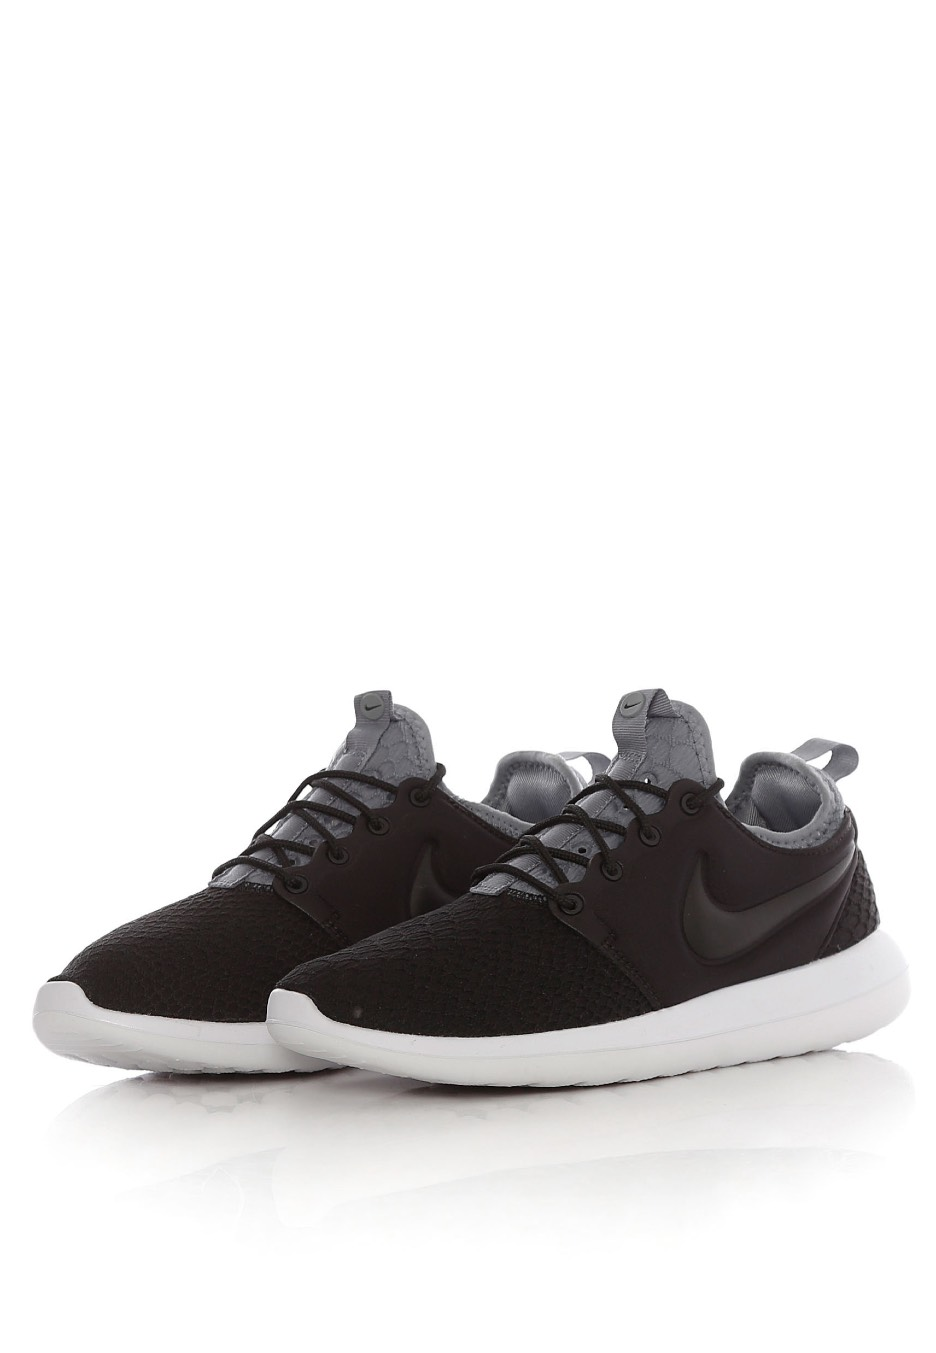 pretty nice f2dea 15026 ... new zealand nike roshe two se black black cool grey white girl shoes  de2e0 4bcfc